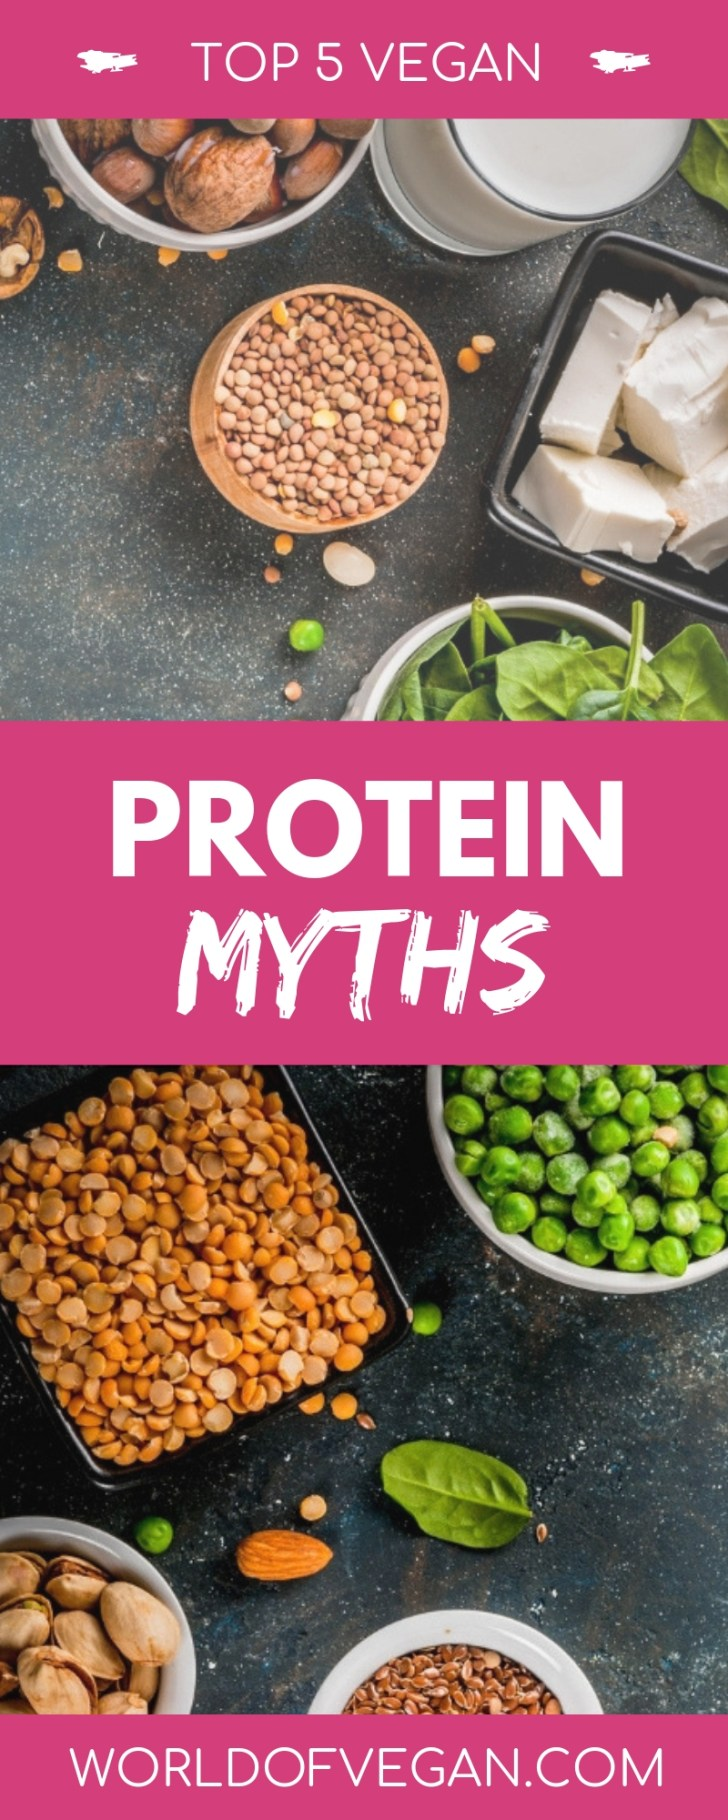 Top 5 Vegan Protein Myths Busted | WorldofVegan.com | #protein #athlete #vegan #vegetarian #health #nutrition